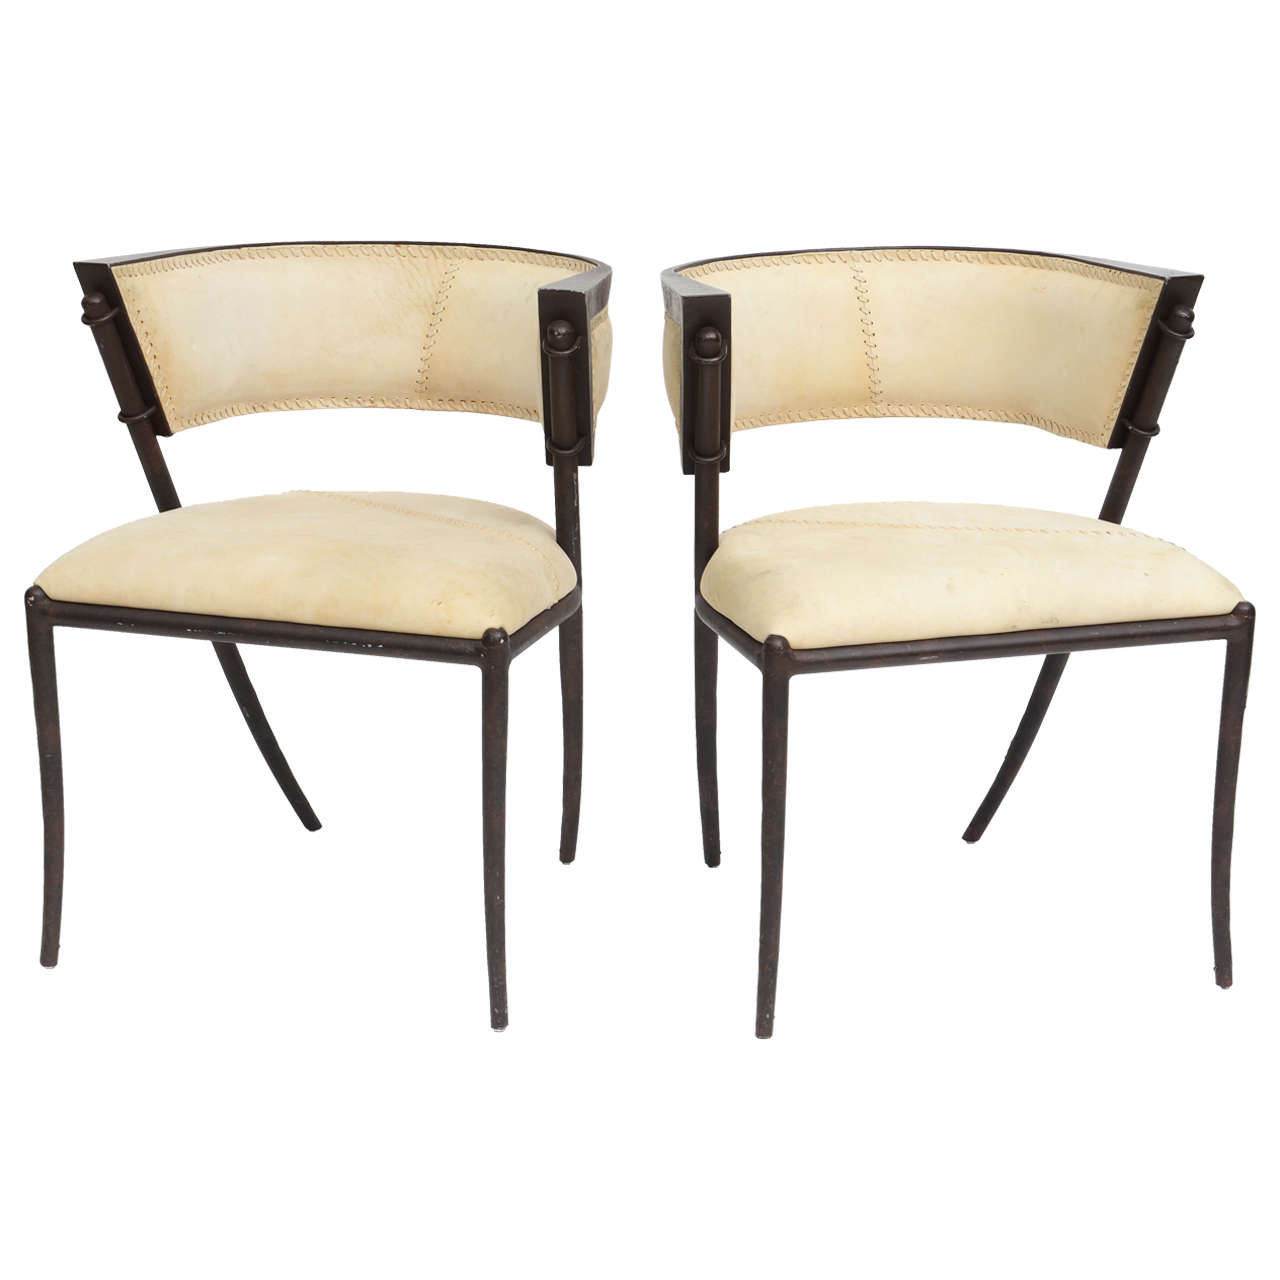 Modern Klismos Chair: Pair Of Italian Modern Klismos Form Bronze And Leather